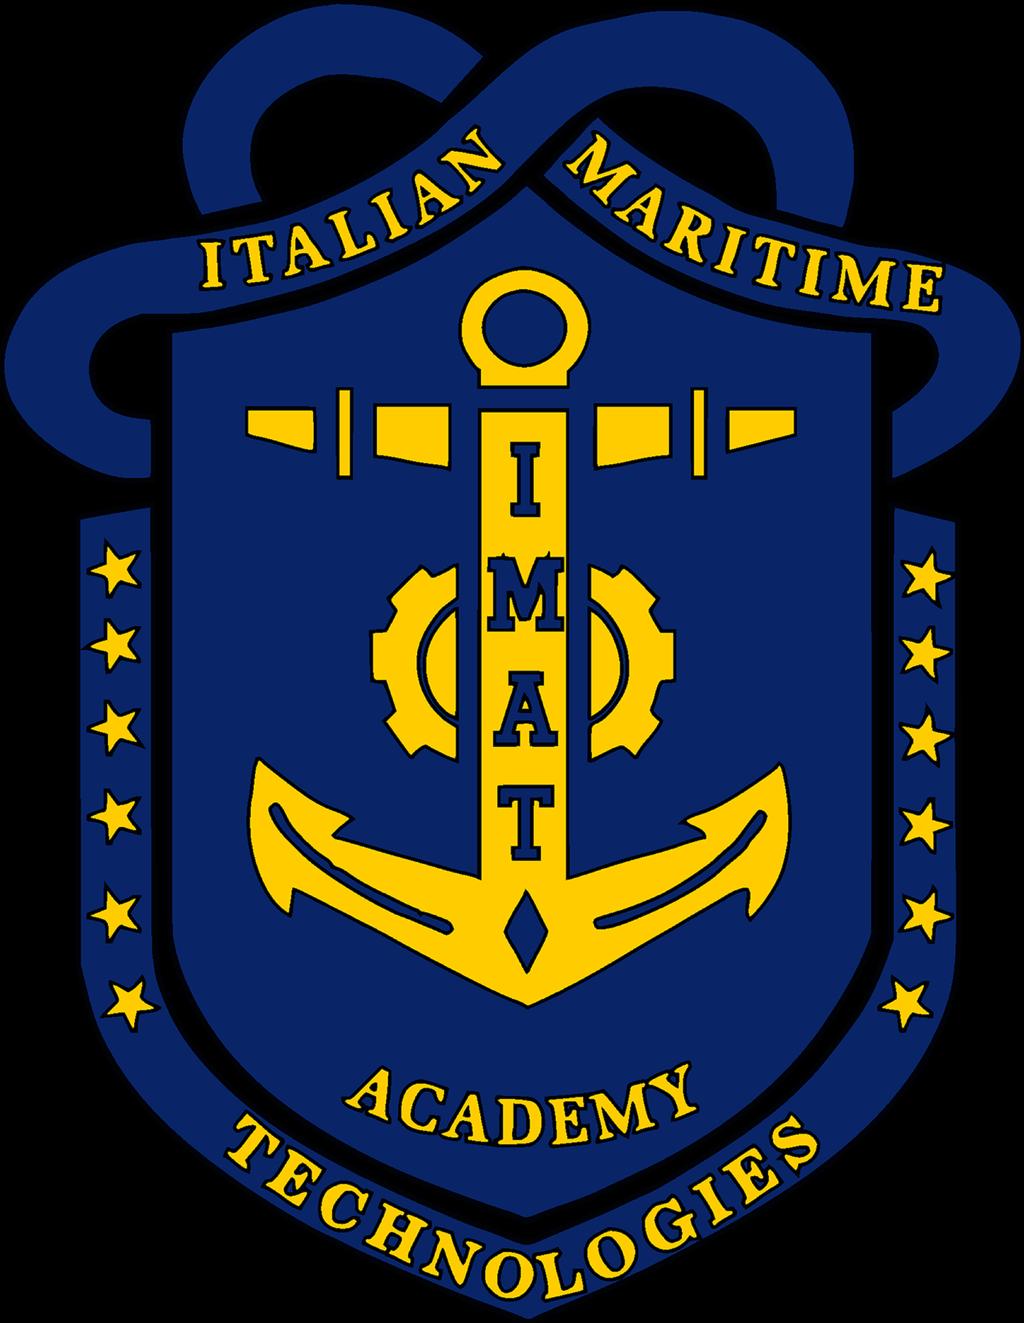 Italian Marittime Accademy Tecnologies